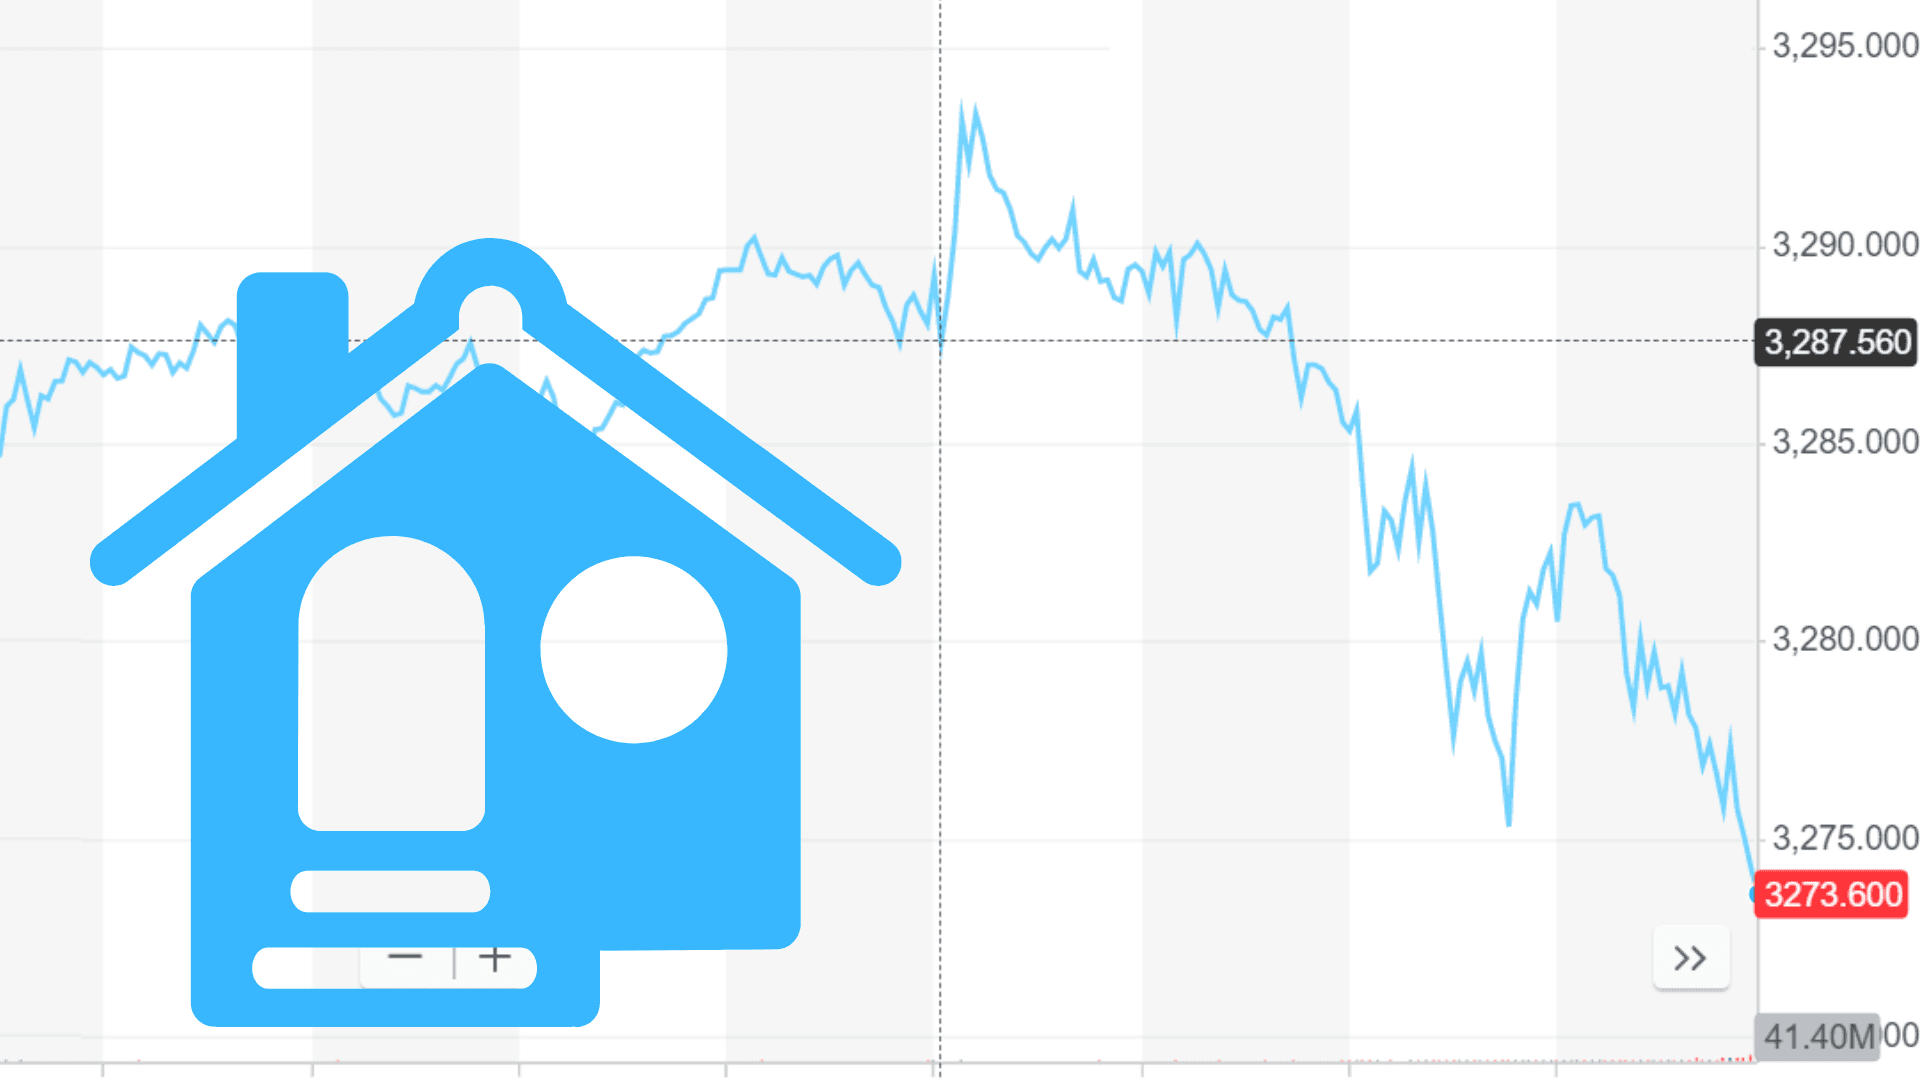 Downgrade of U.S. Household Spending From